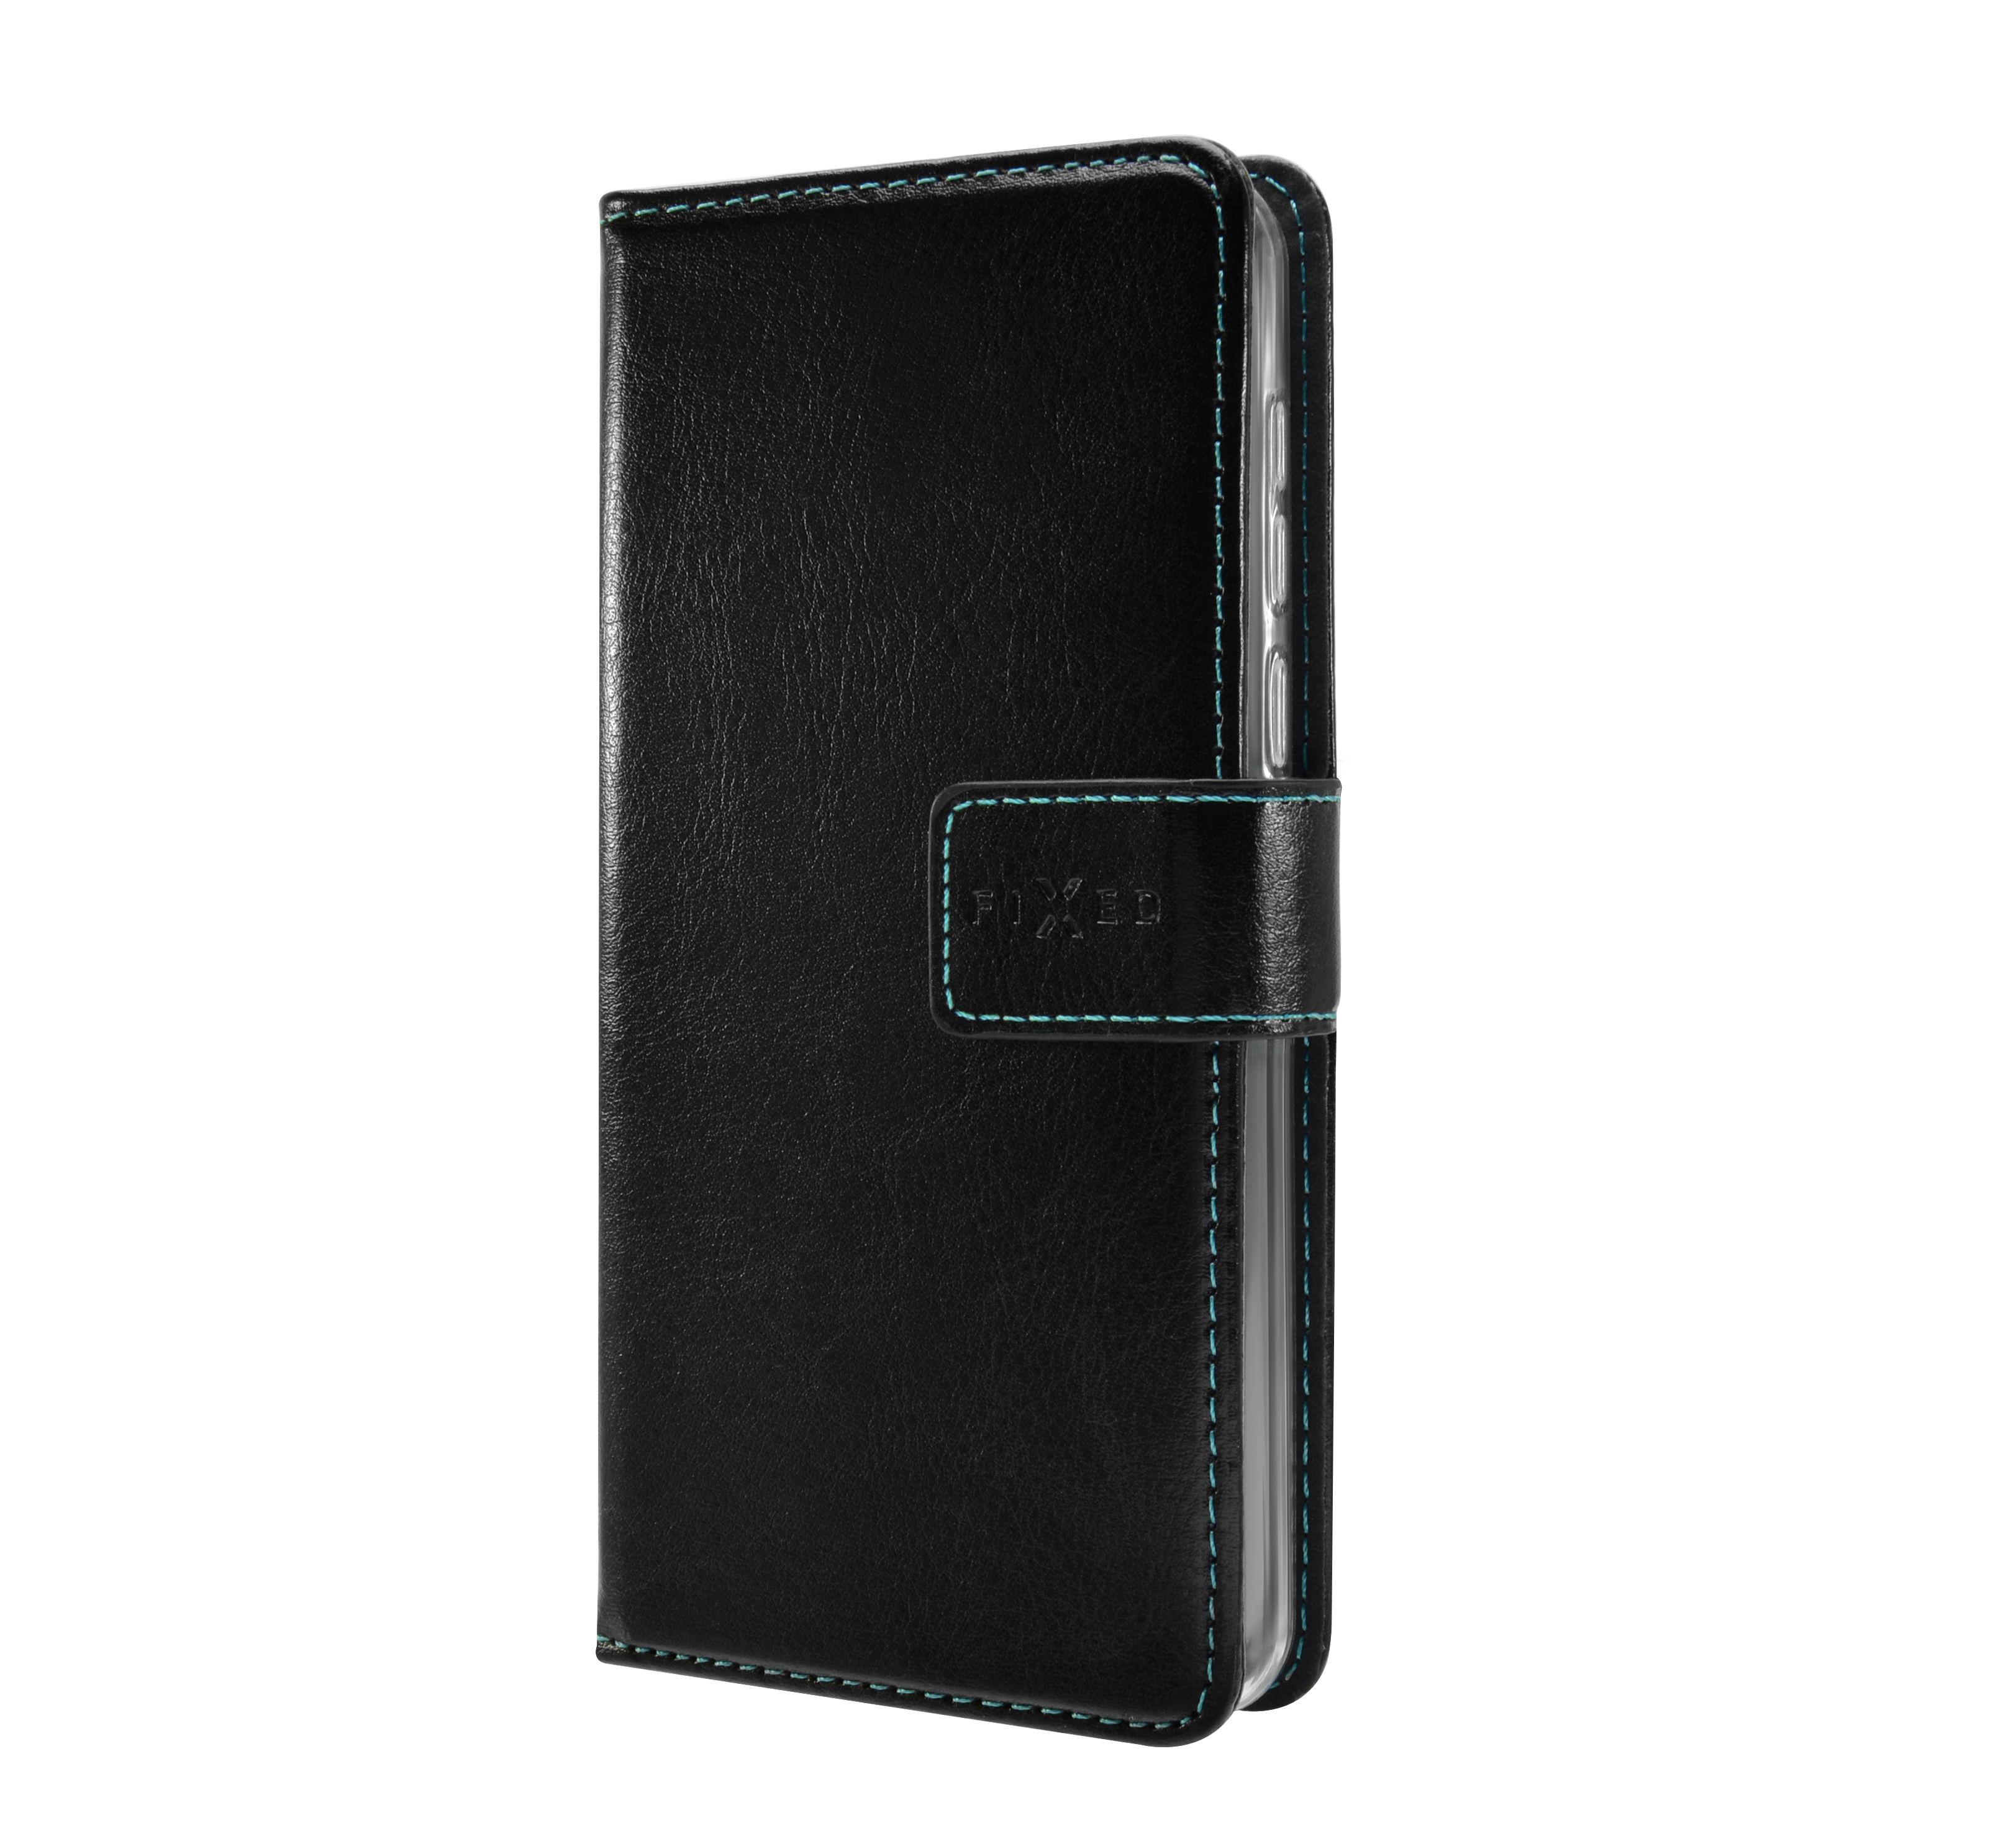 Pouzdro typu kniha FIXED Opus pro ASUS ZenFone 5 Lite (ZC600KL), černé